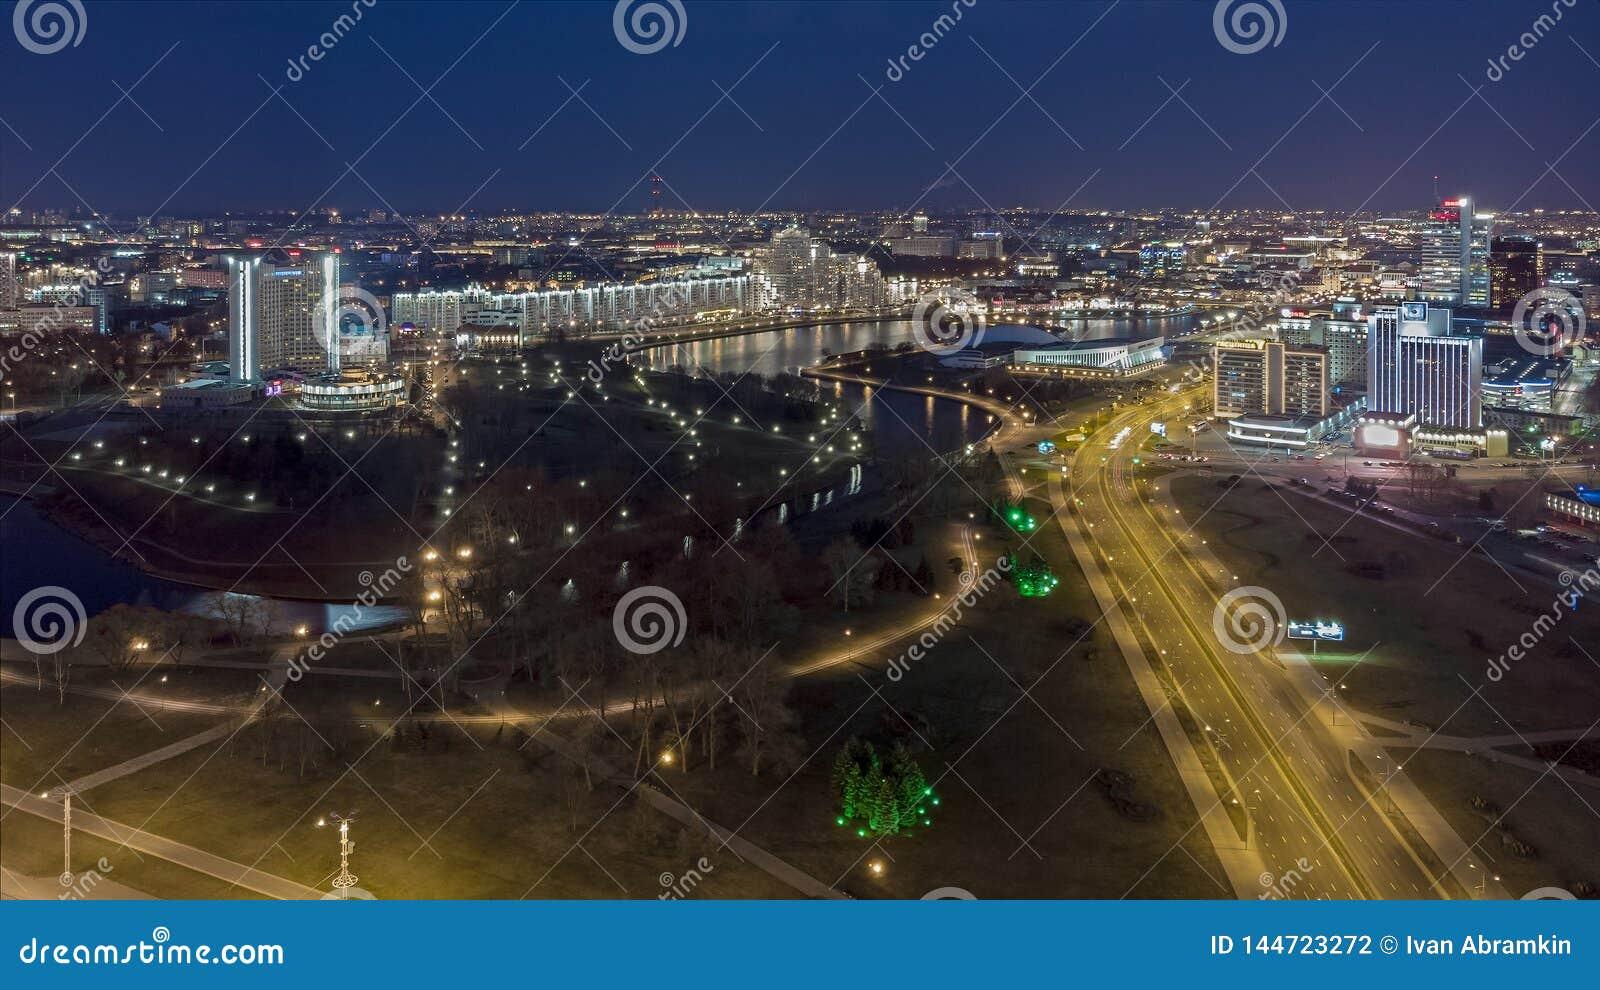 Night Minsk, Belarus. Drone aerial photo